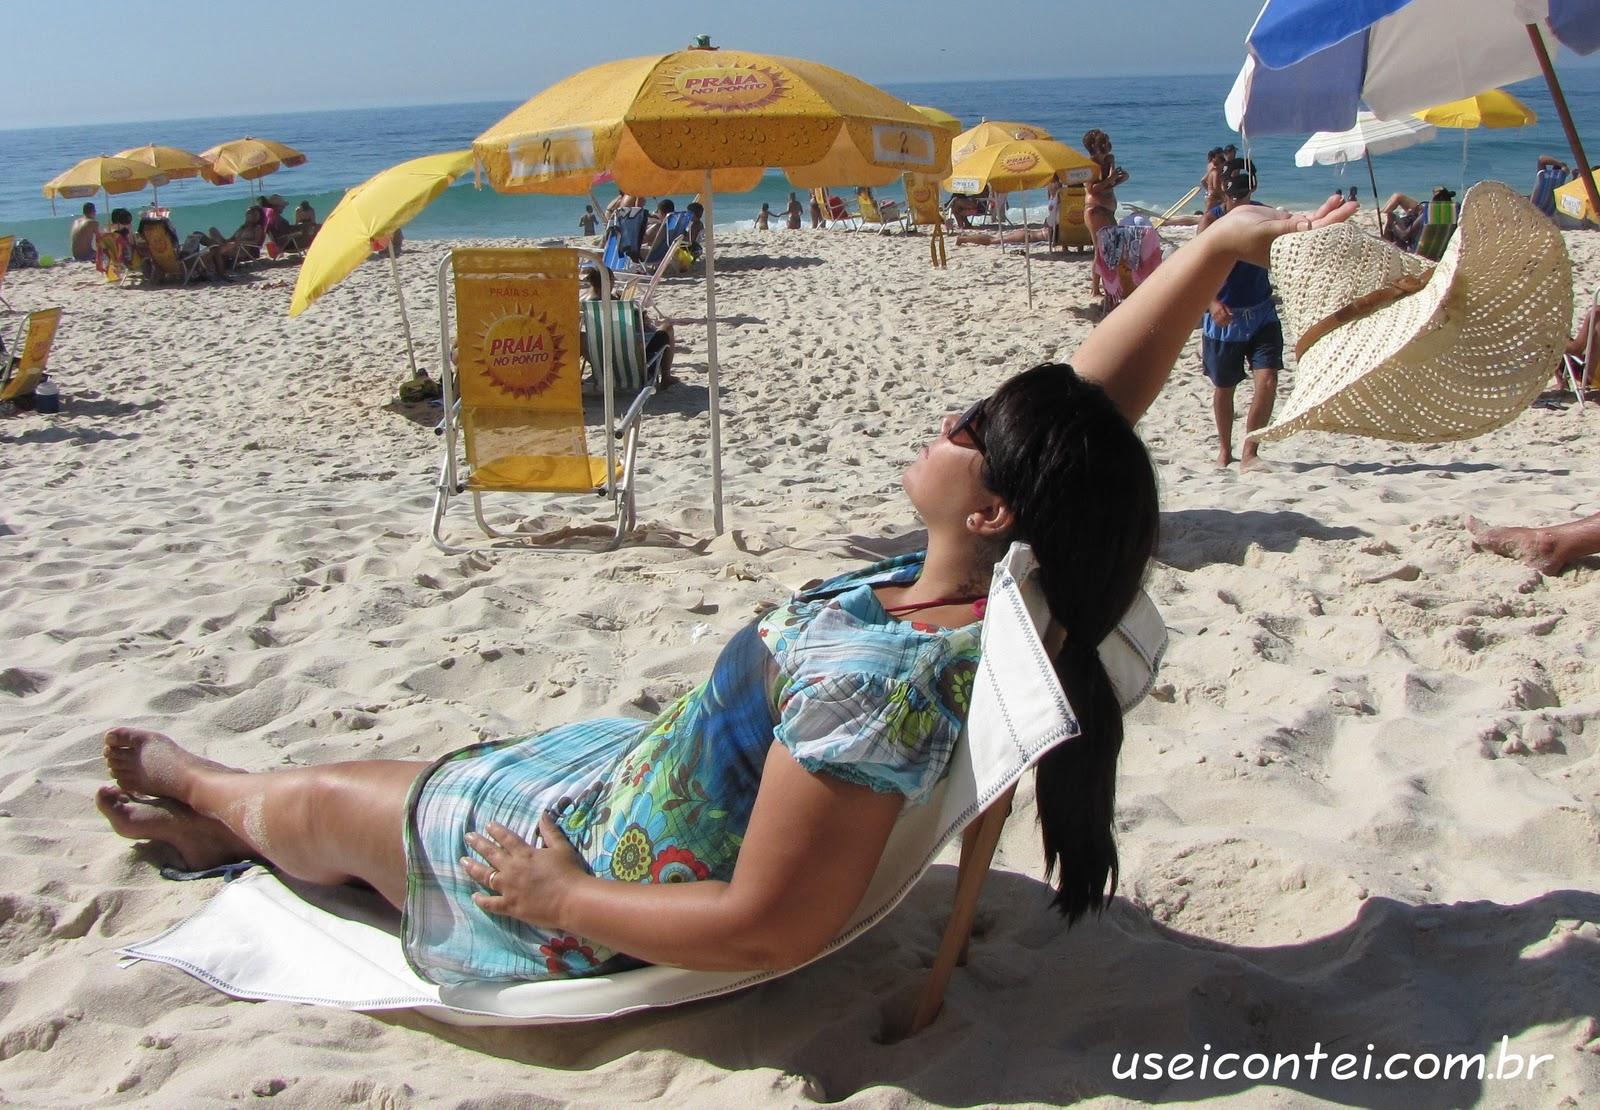 cadeira de praia de praia track field.jpg #6A442E 1600x1110